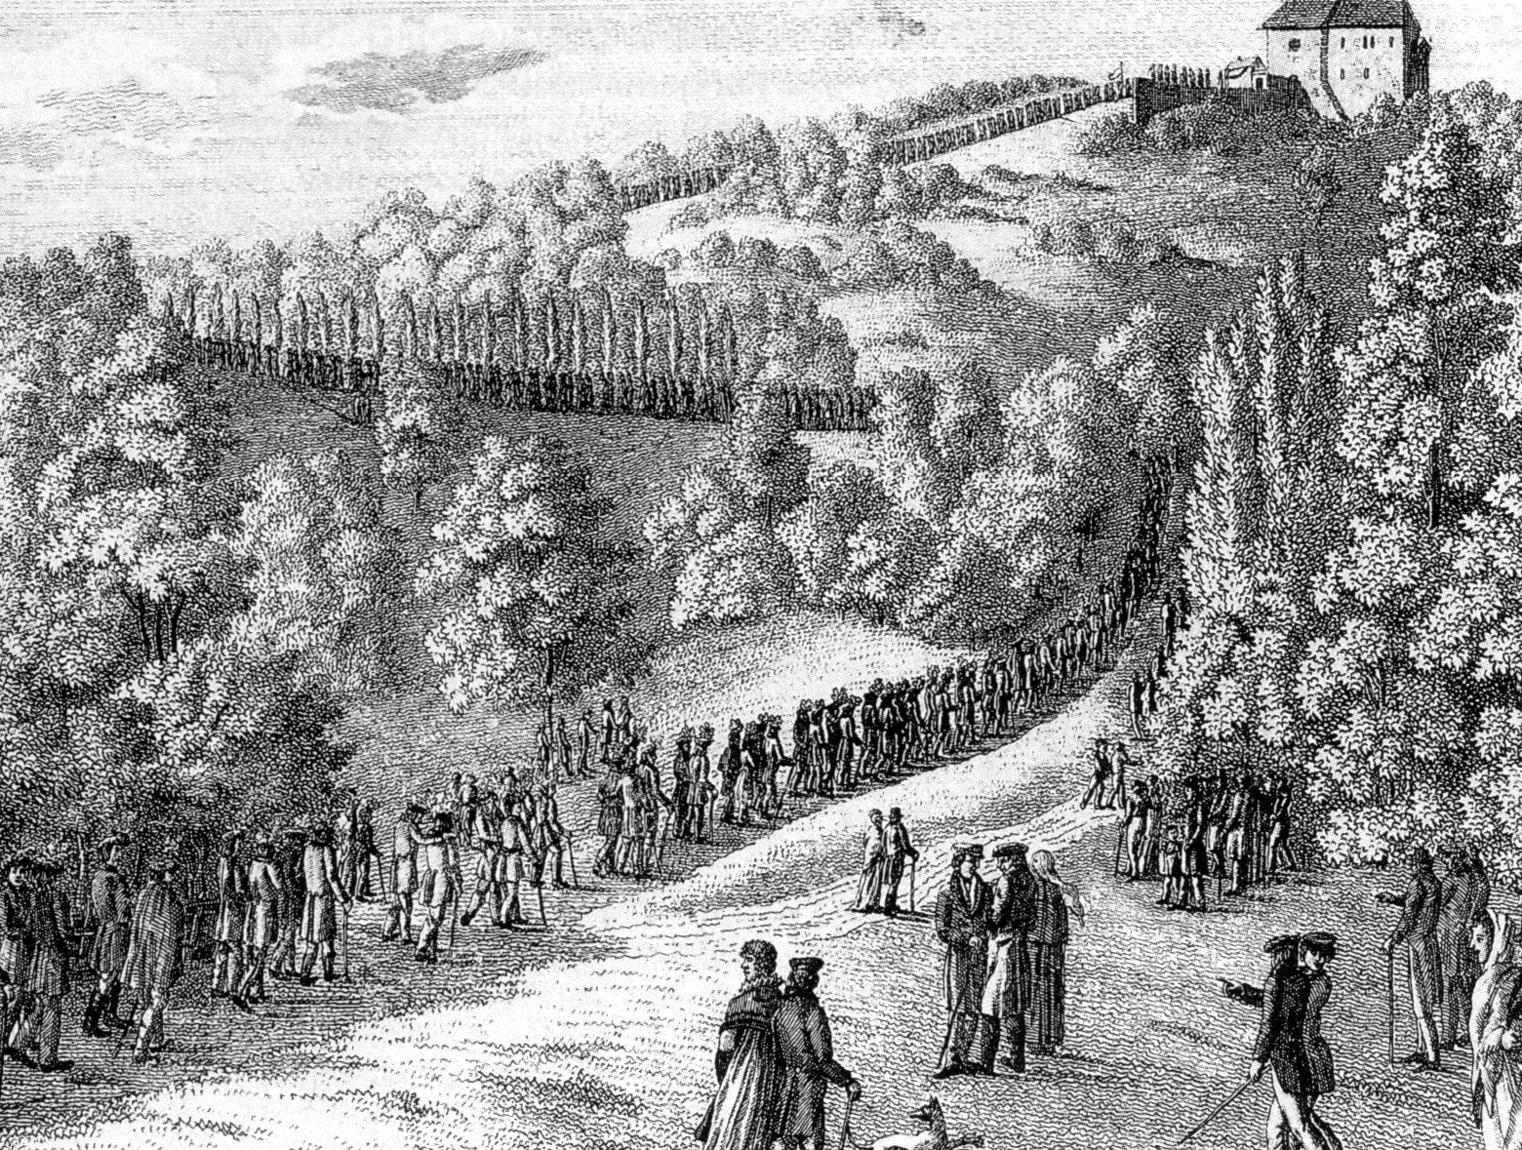 File:Wartburg-Studentenzug-1817.jpg